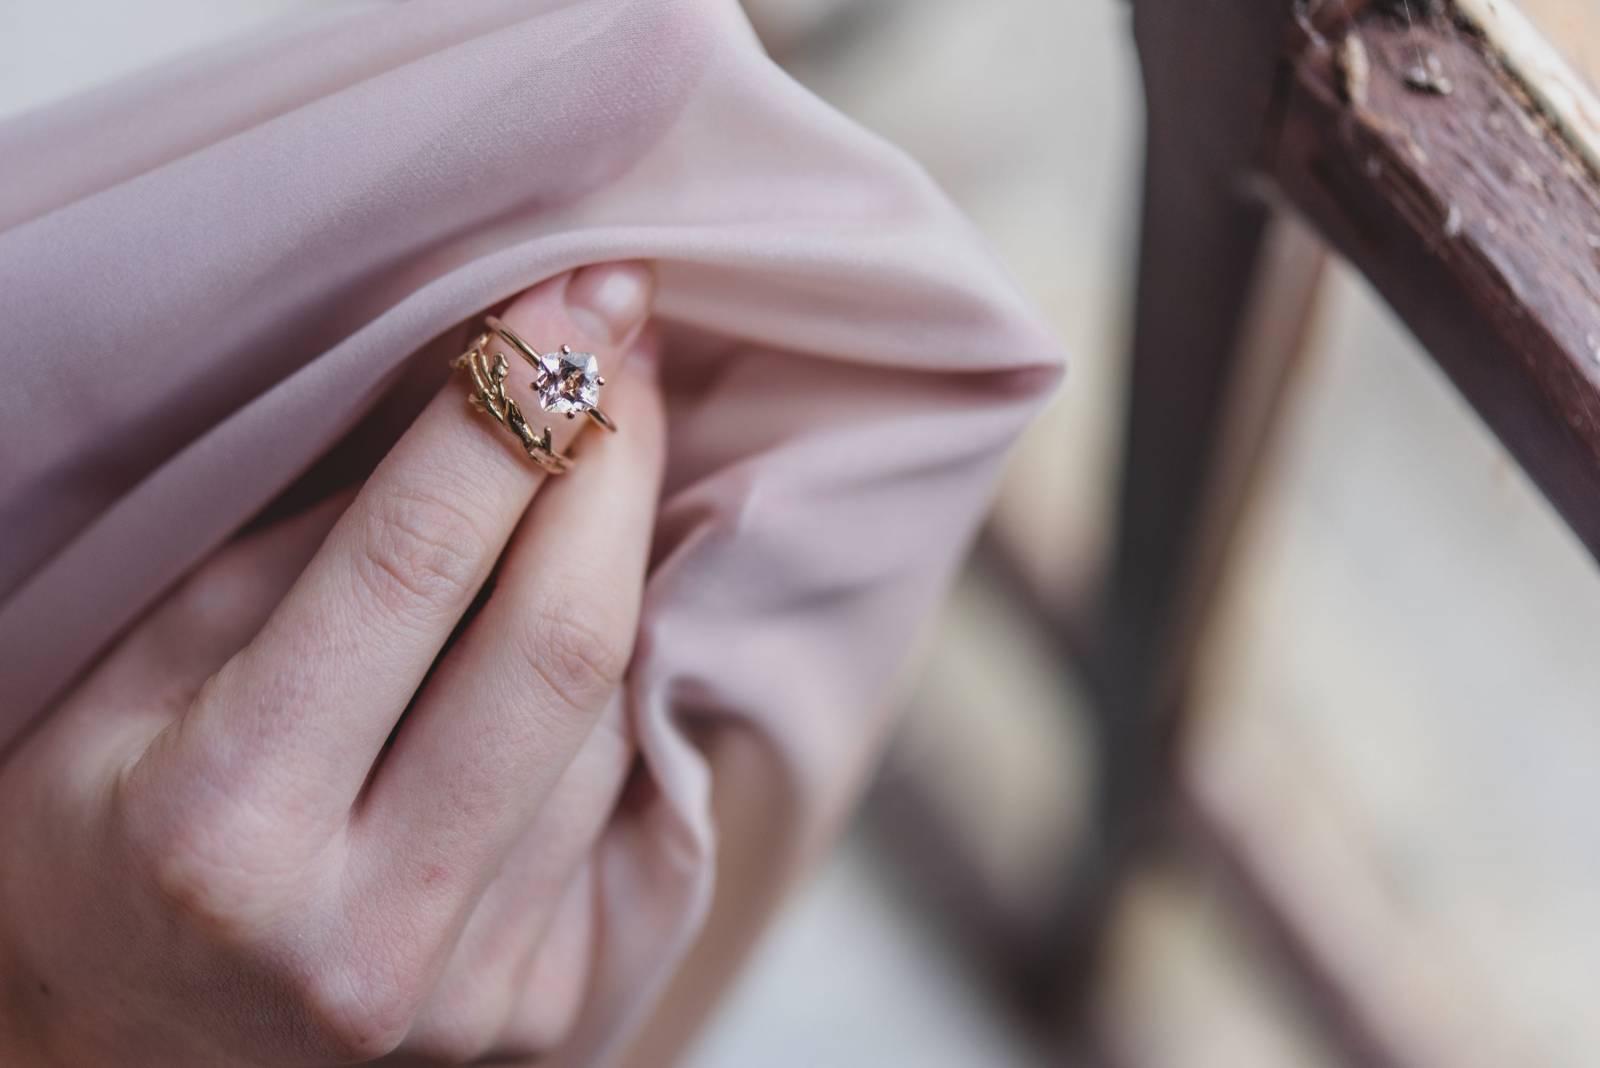 Nathalie Swinnen - Juwelen - Bruidsjuwelen - Verlovingsring - Trouwring - House of Weddings - 5